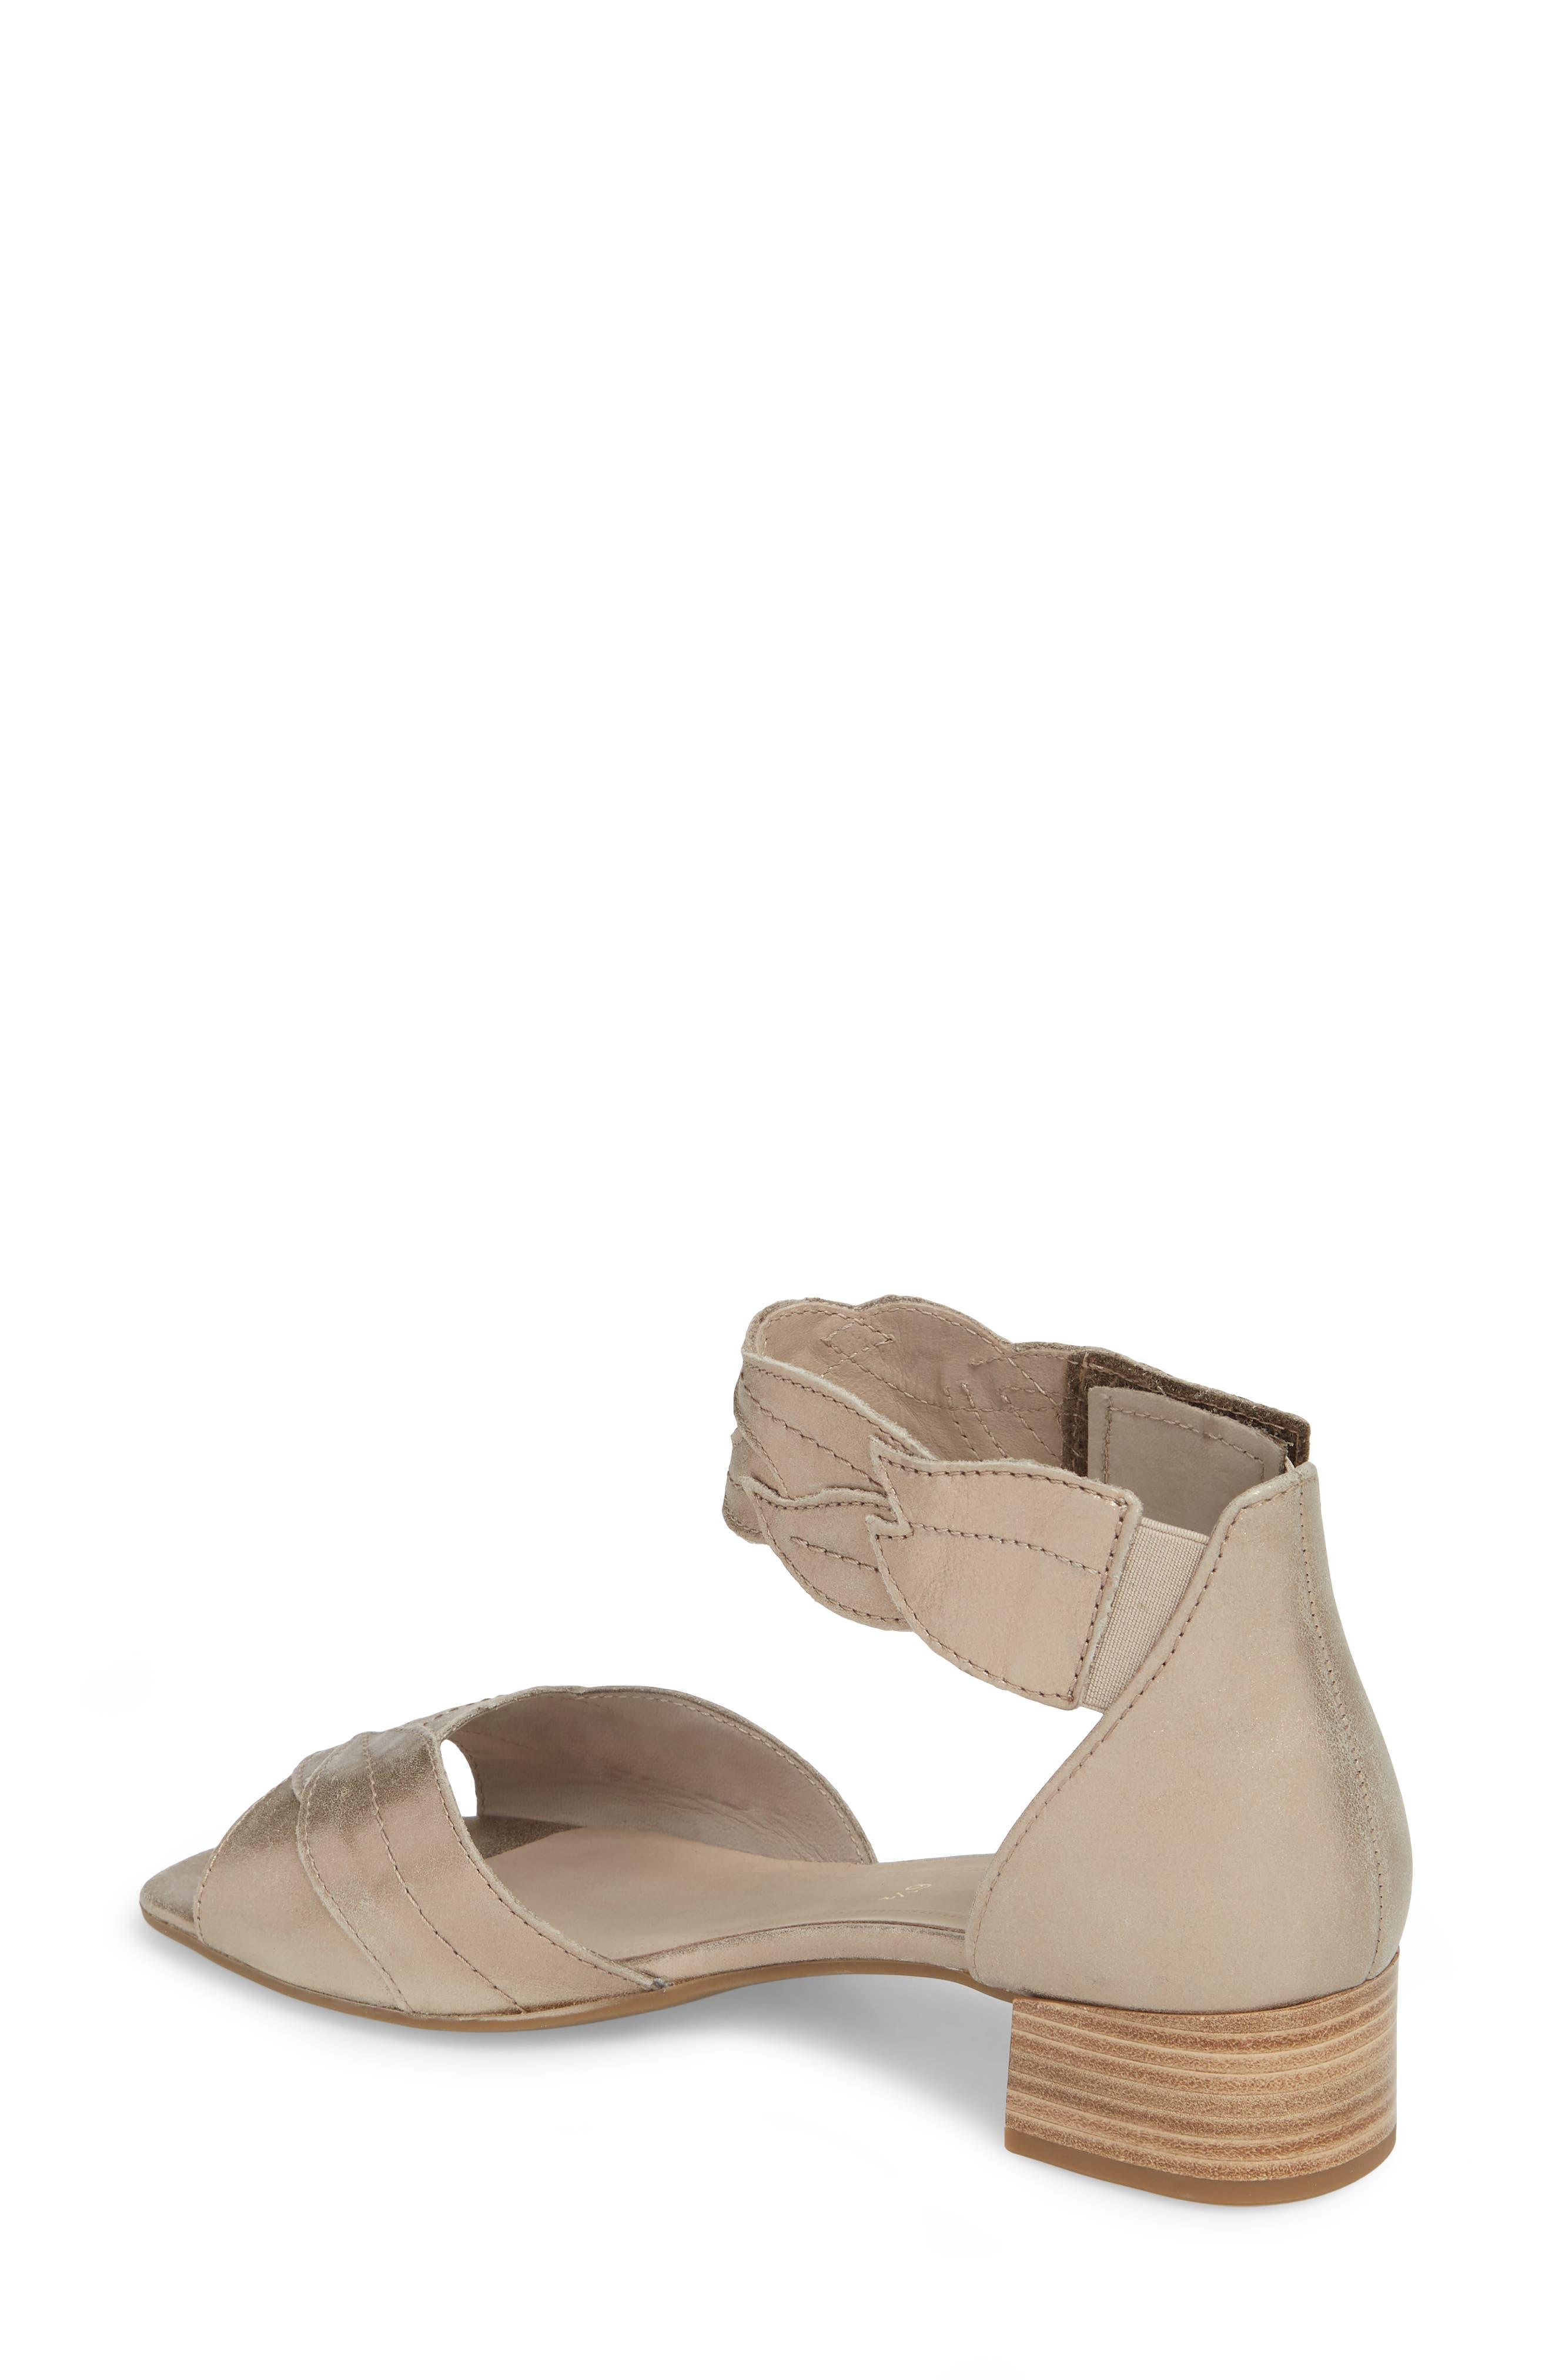 Leaf Ankle Strap Sandal,                             Alternate thumbnail 2, color,                             BEIGE METALLIC LEATHER